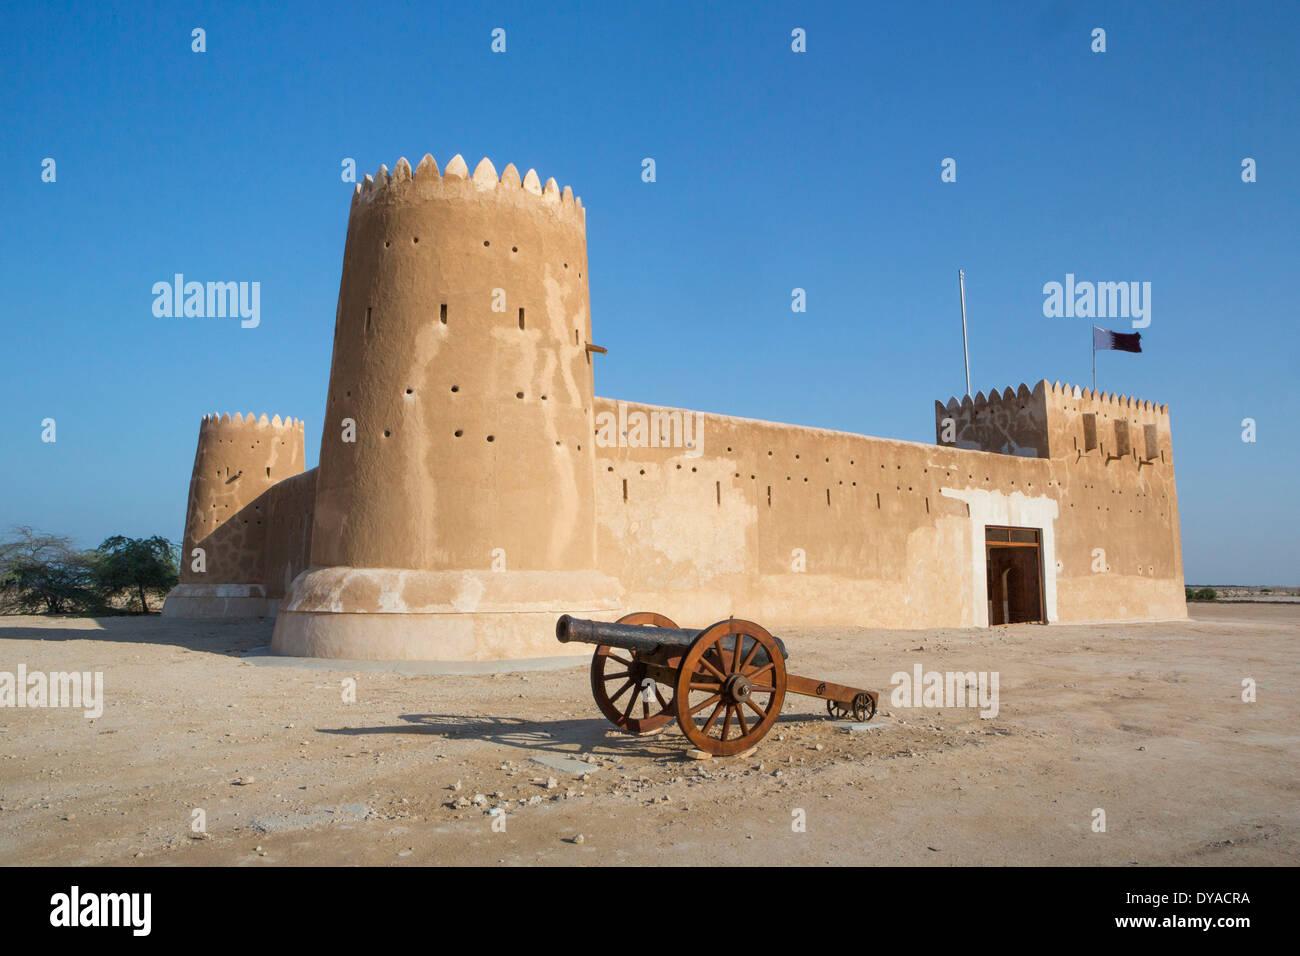 gun fortification World Heritage Al Zubarah Qatar Middle East architecture canon landmark fort history museum site travel un - Stock Image